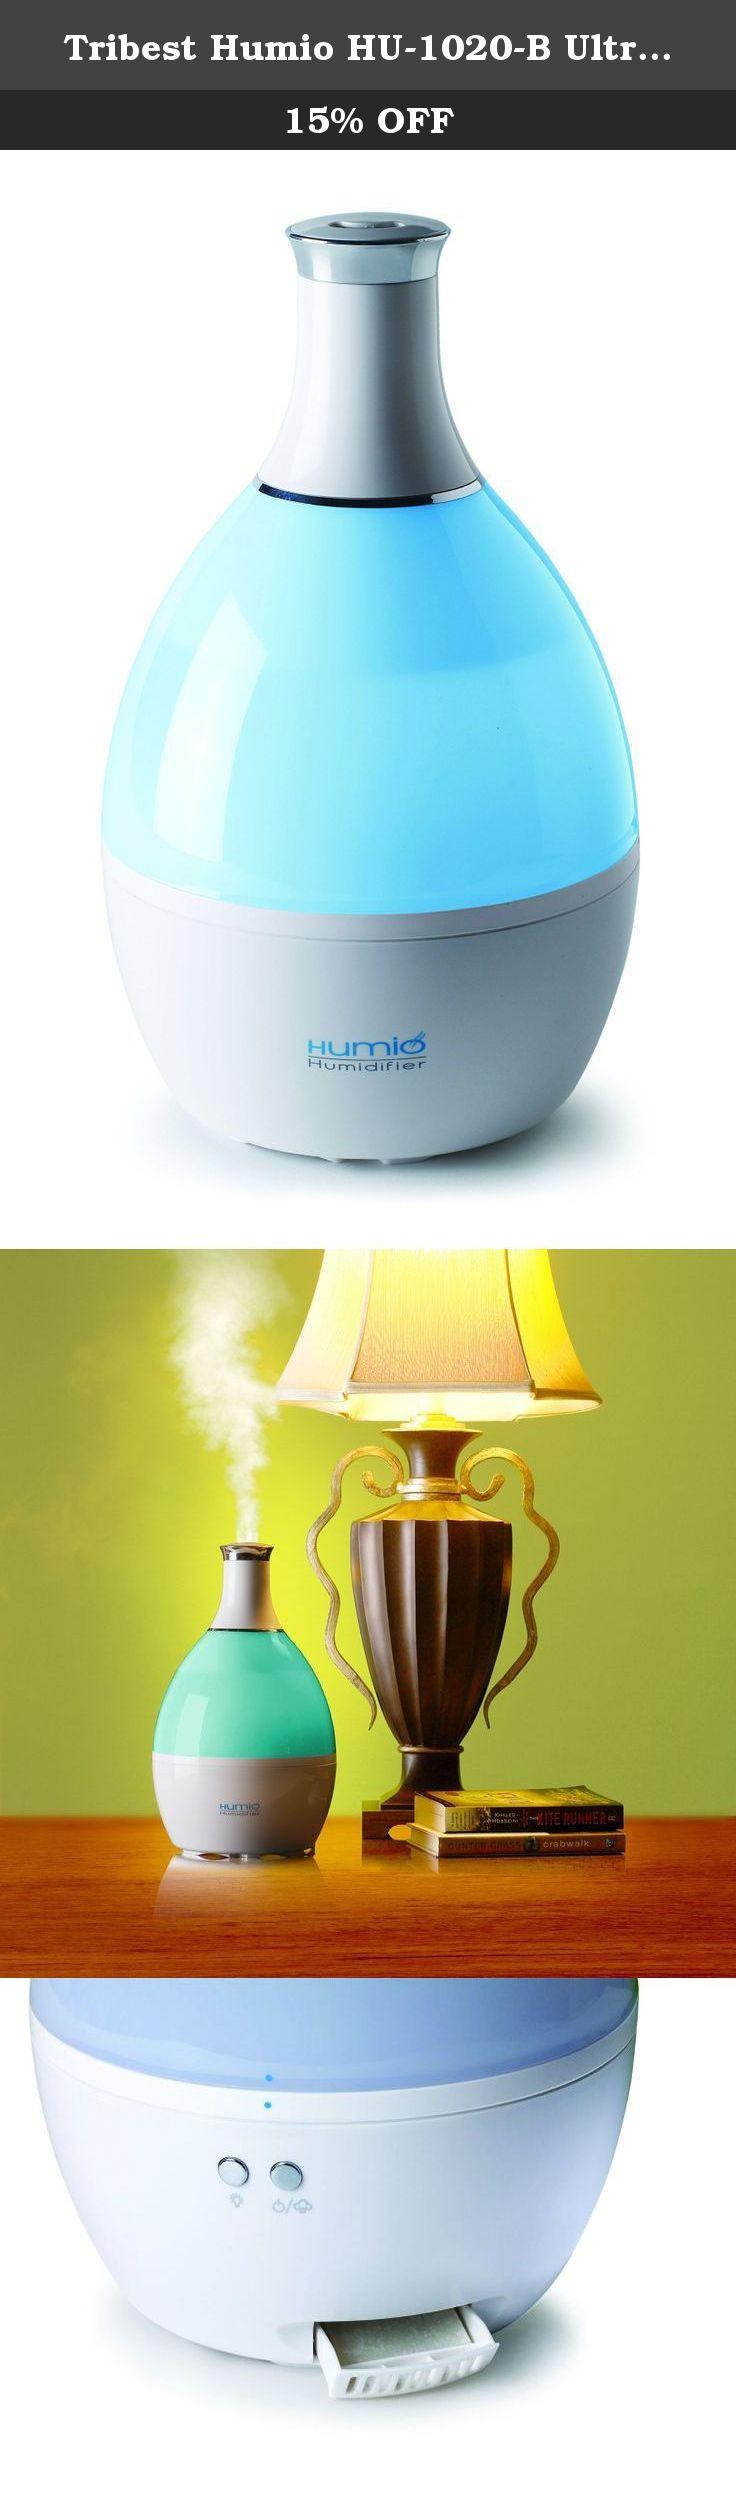 Tribest Humio HU 1020 B Ultrasonic Cool Mist Humidifier and